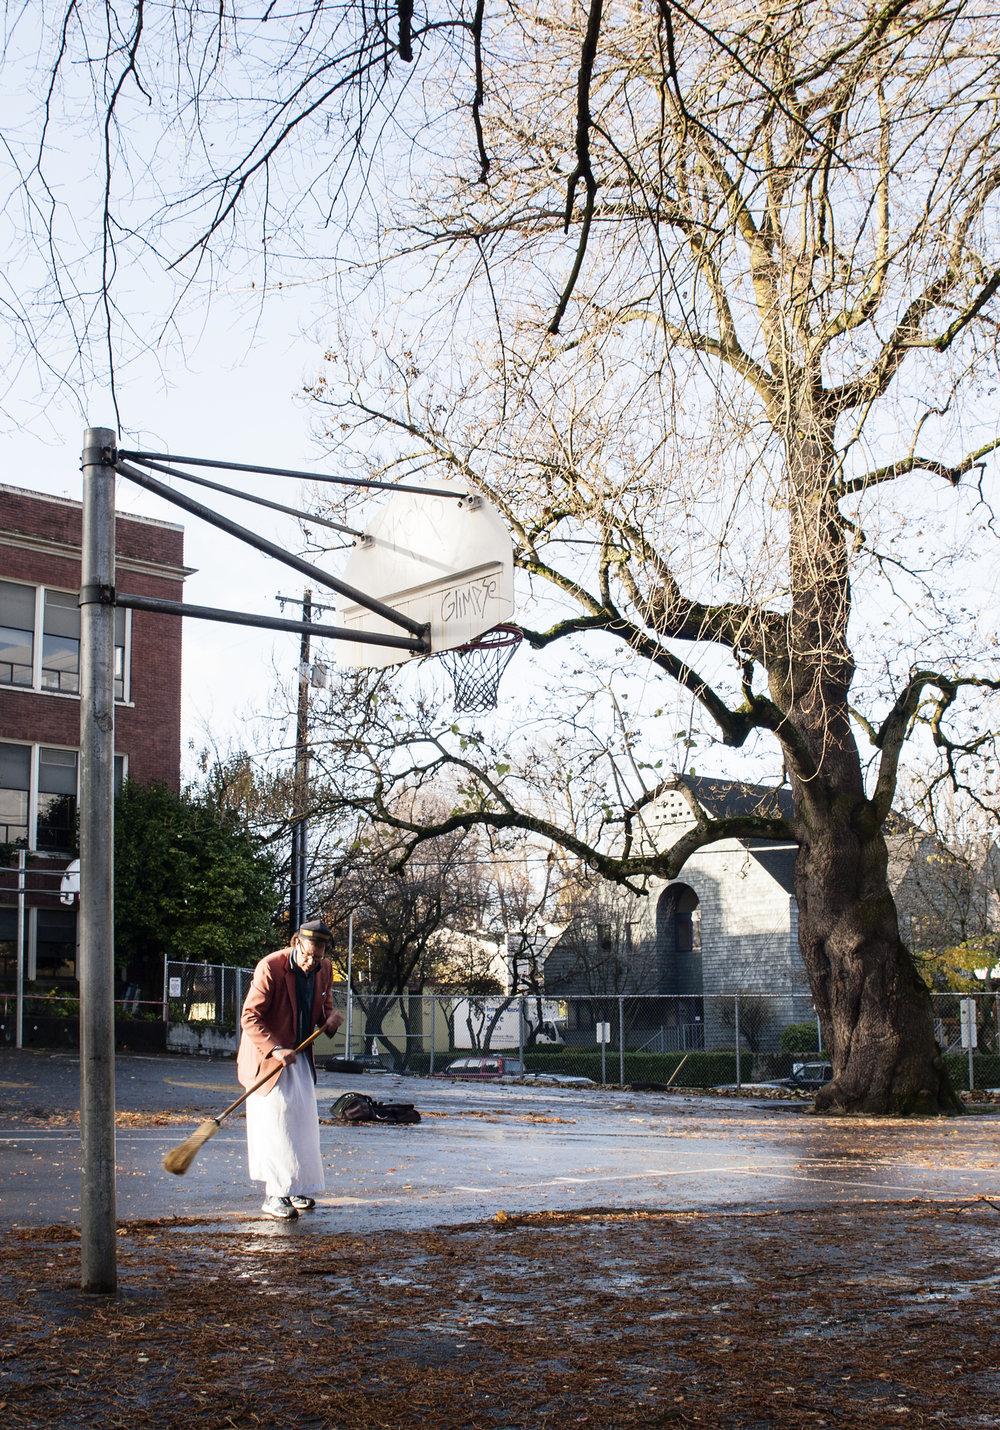 man_sweeping_basketball_court_web.jpg